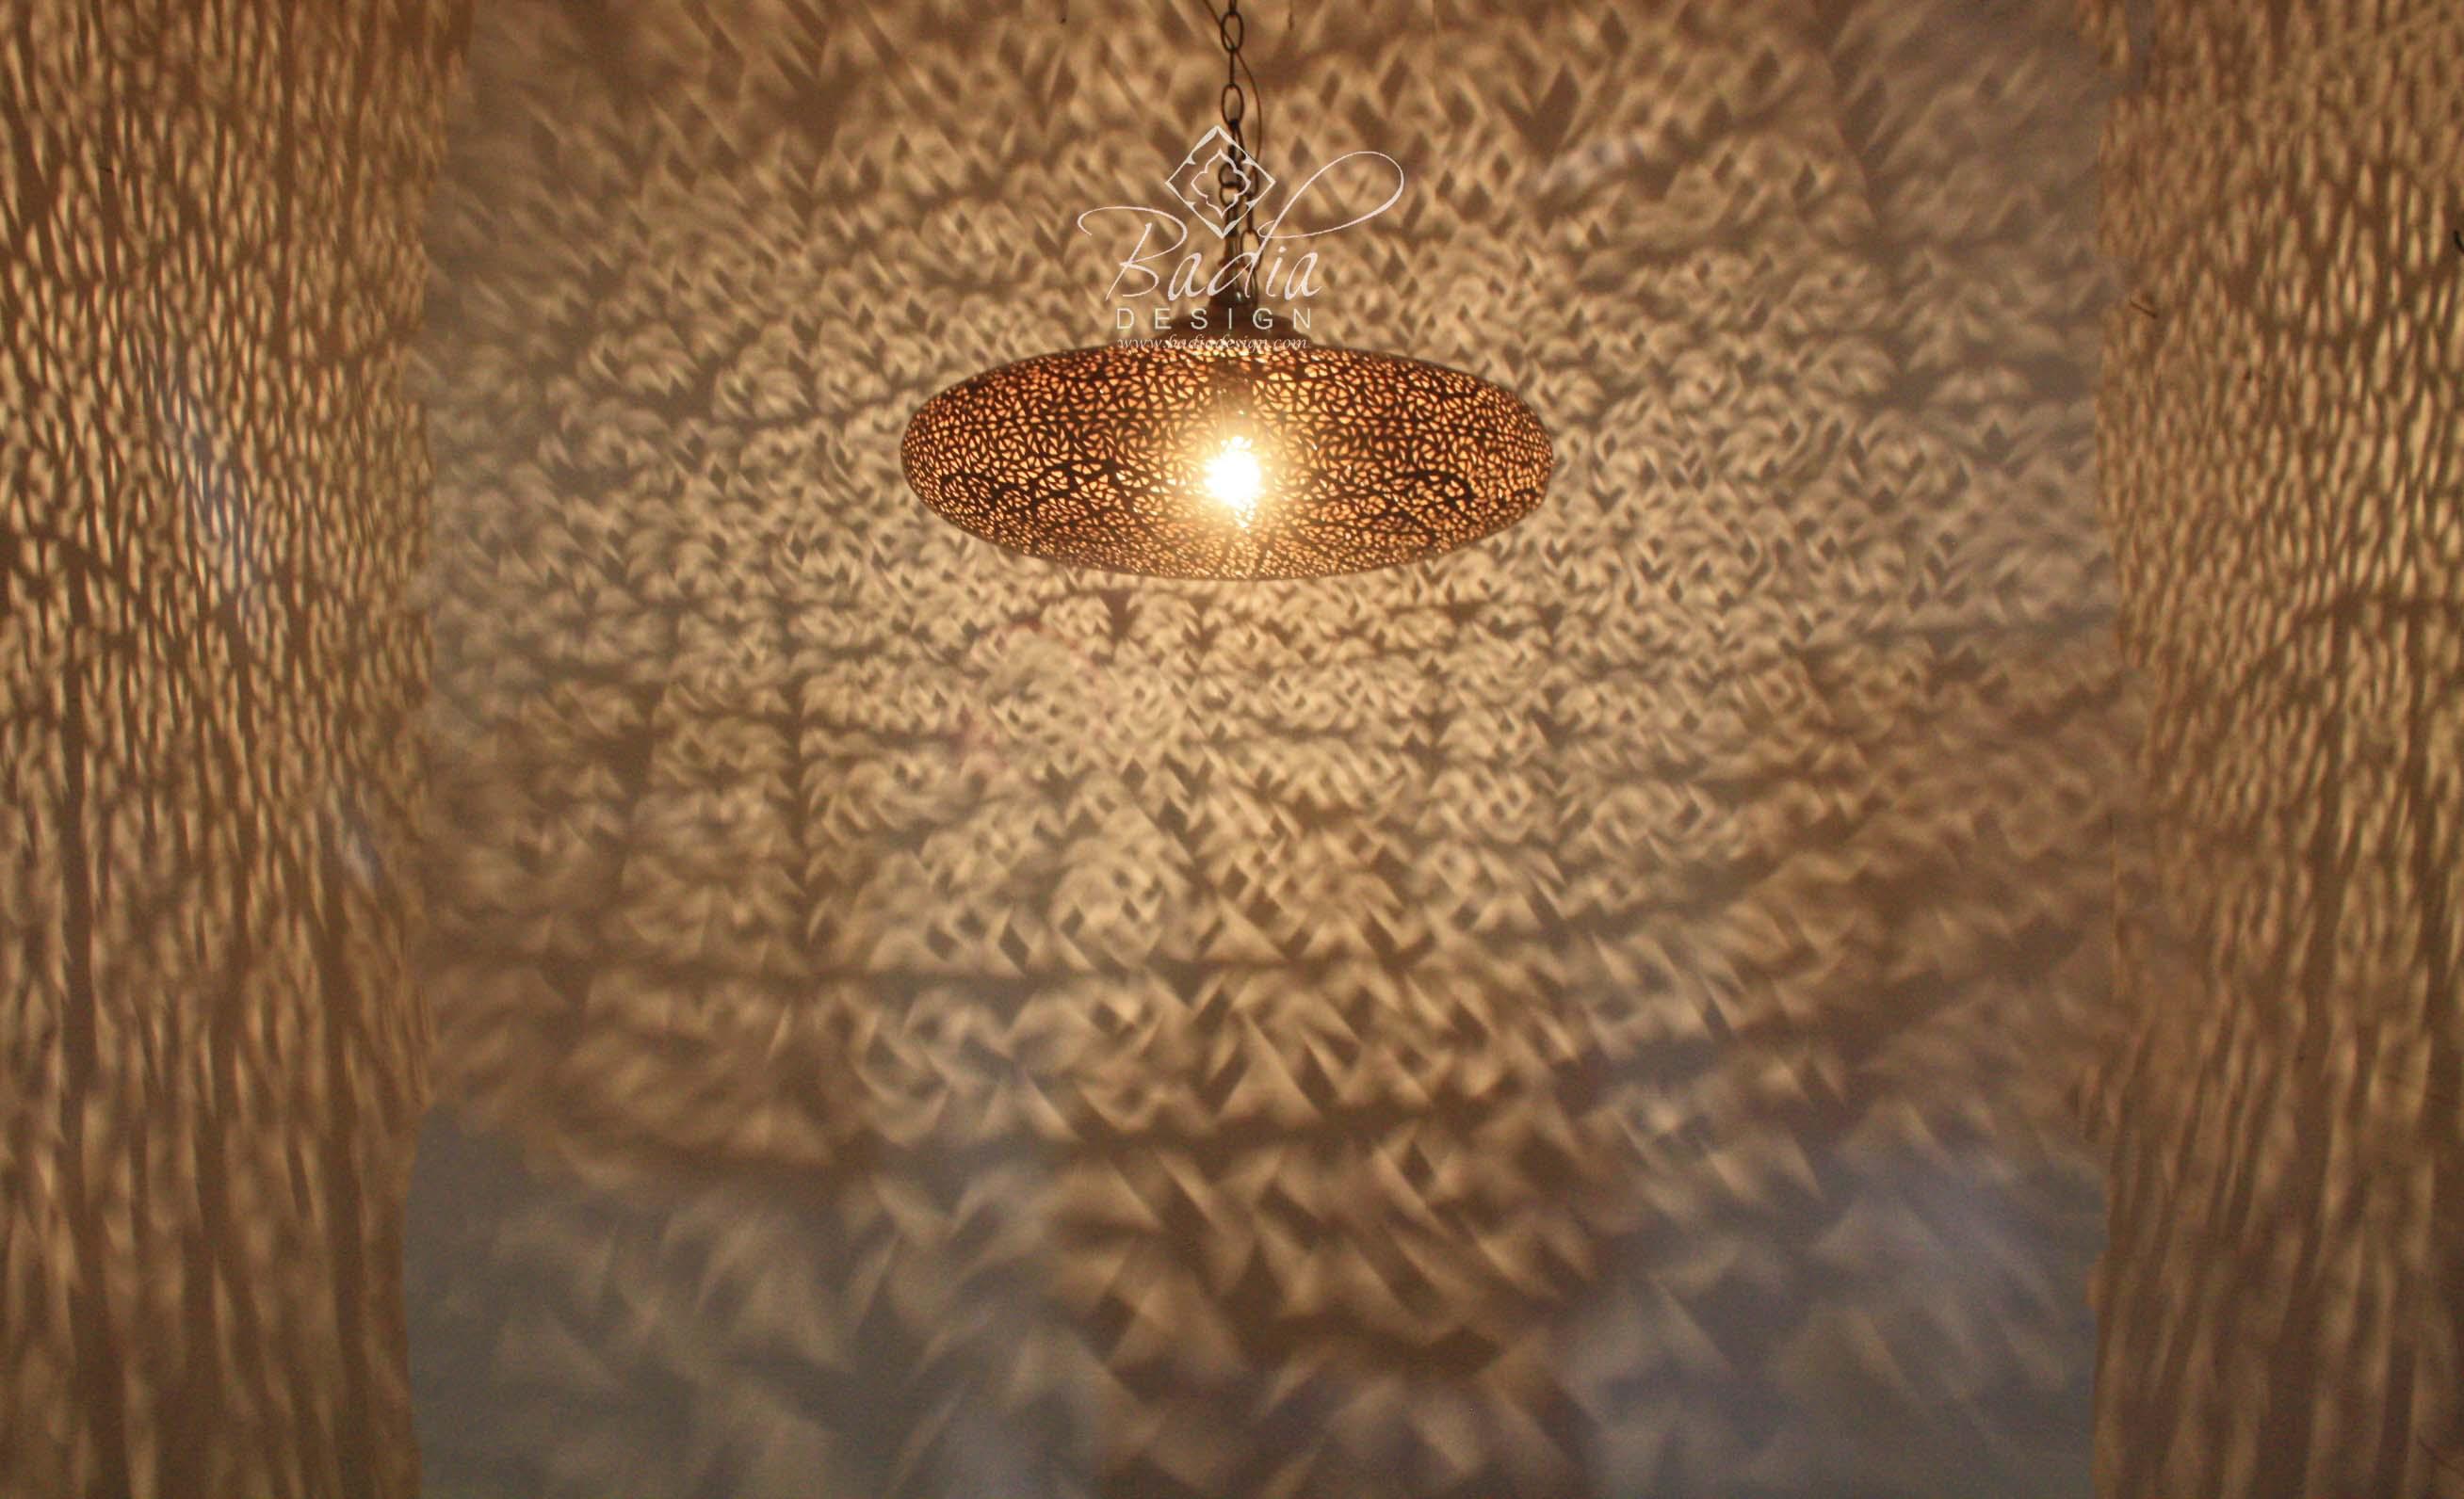 moroccan-ufo-shaped-brass-lantern-lig355-2.jpg